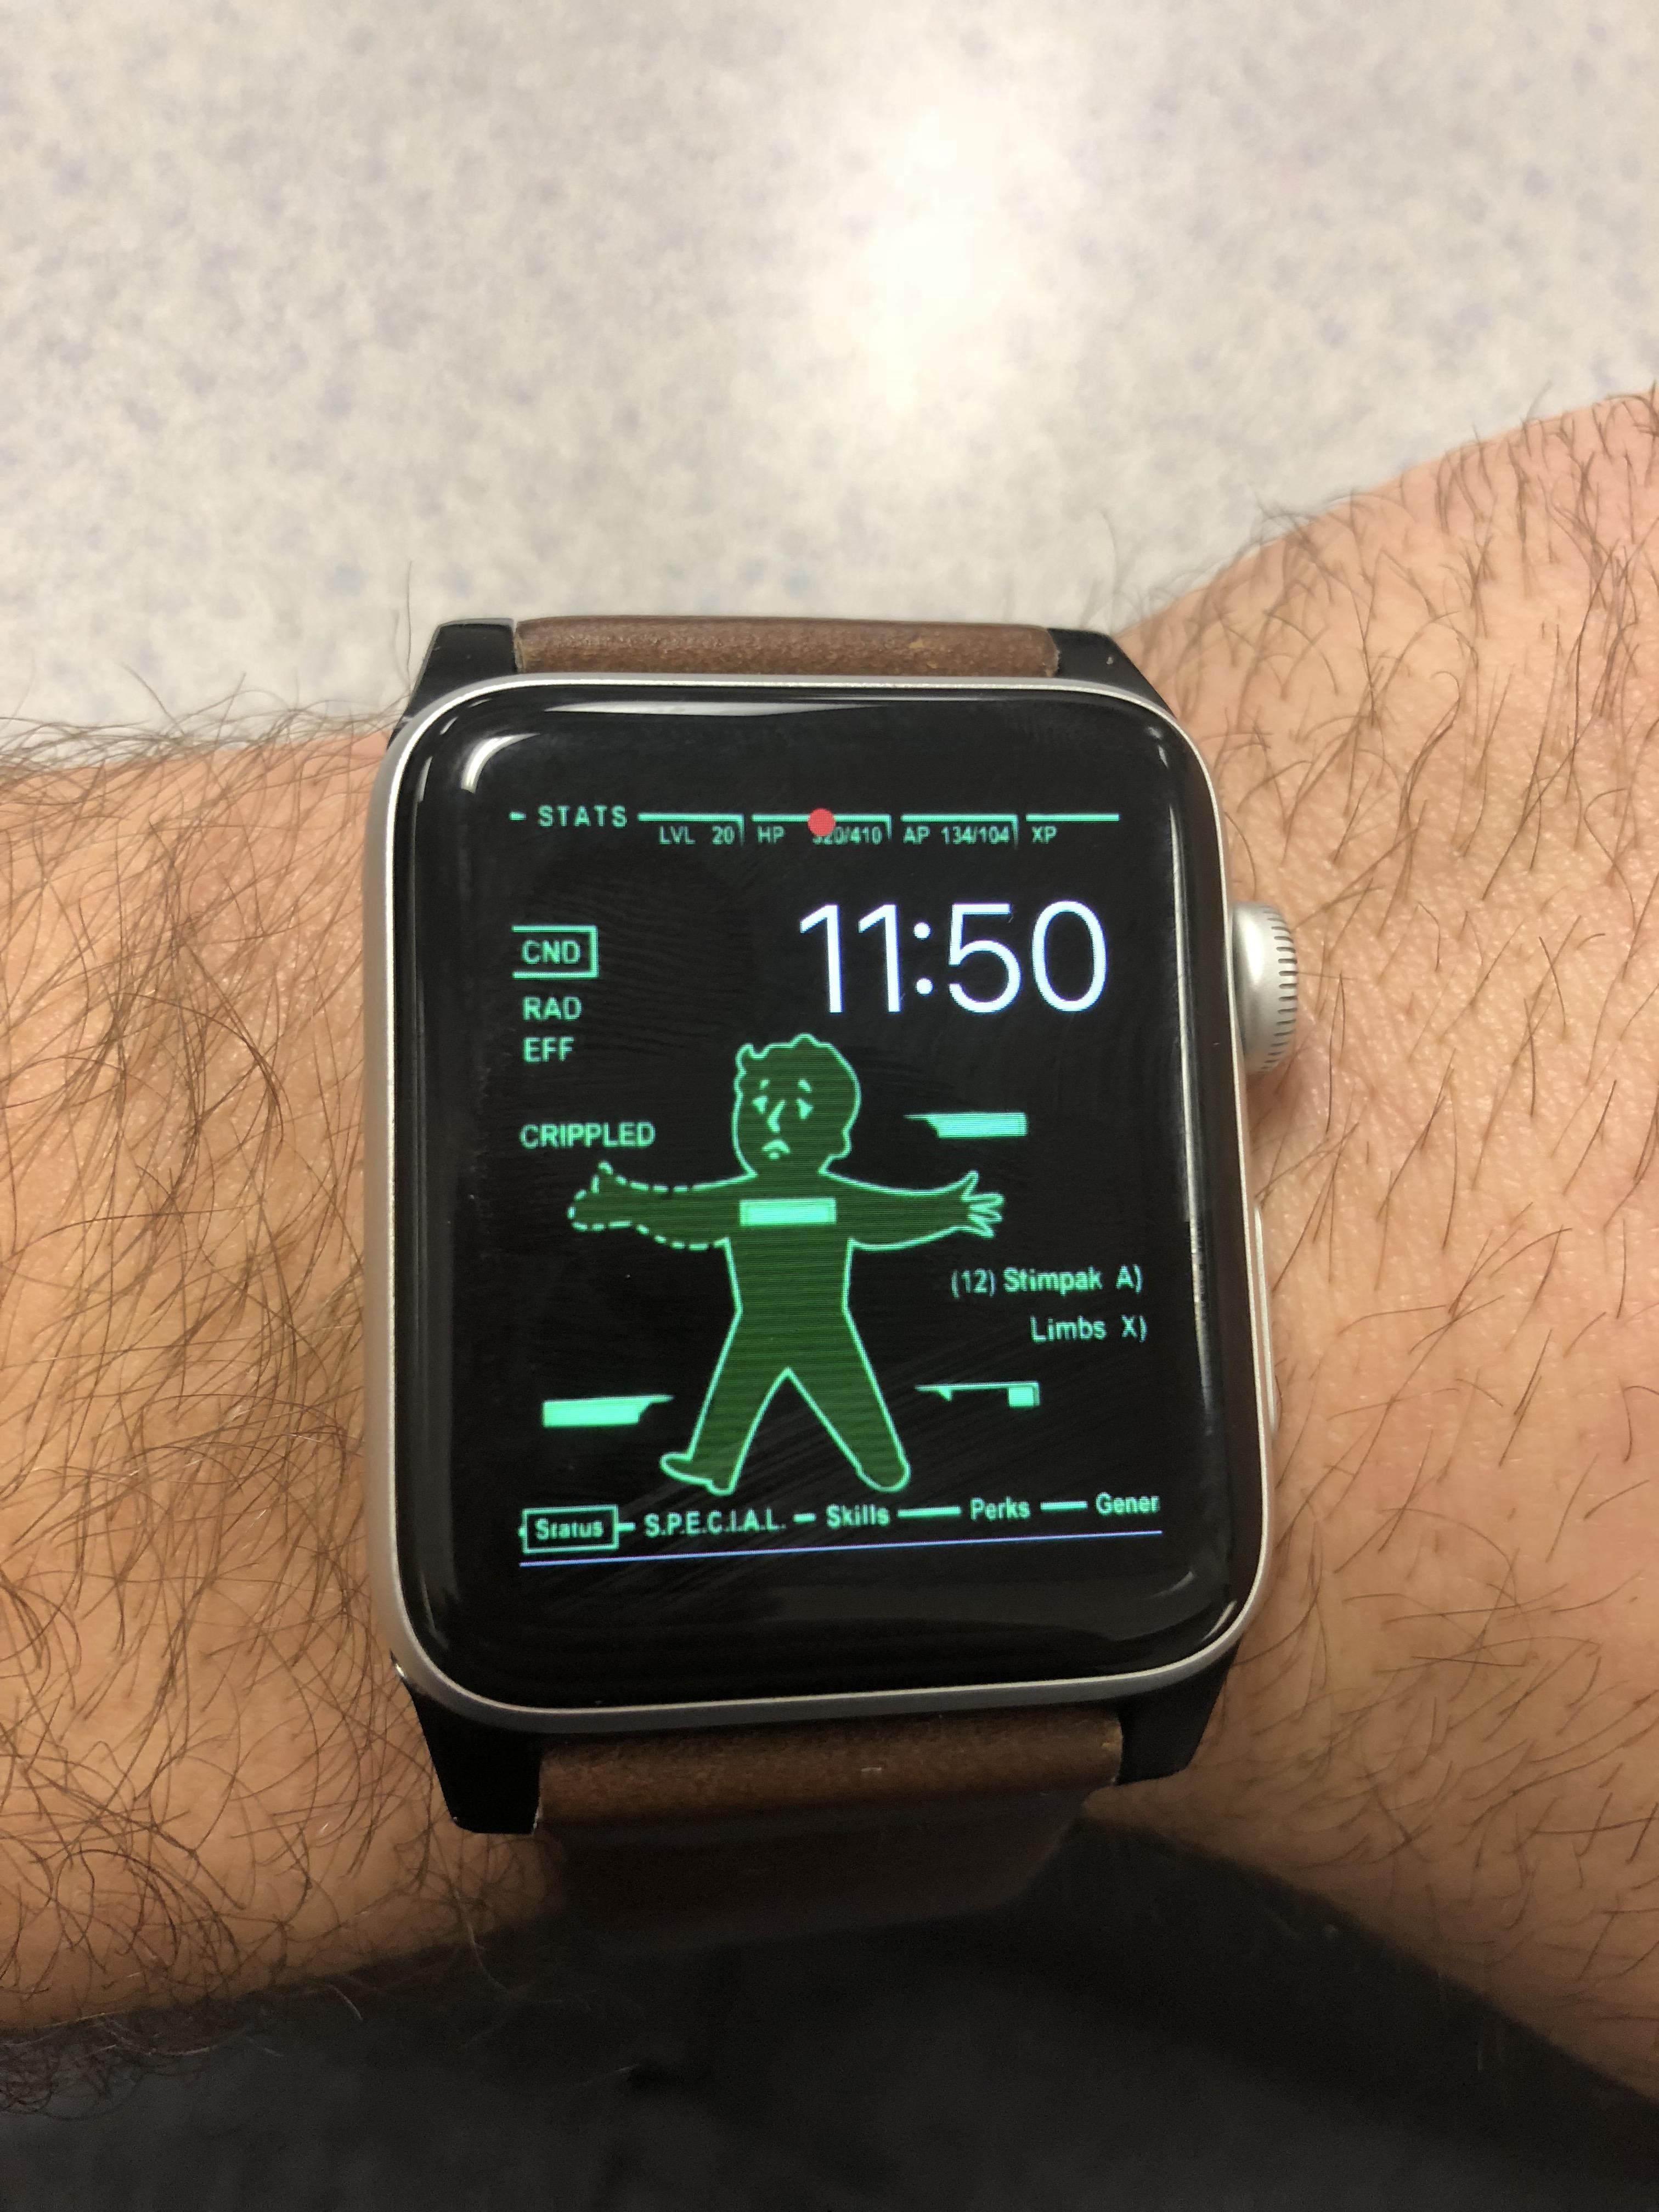 Fallout Apple Watch Face : fallout, apple, watch, Fallout, Apple, Watch, Applewatchfaces